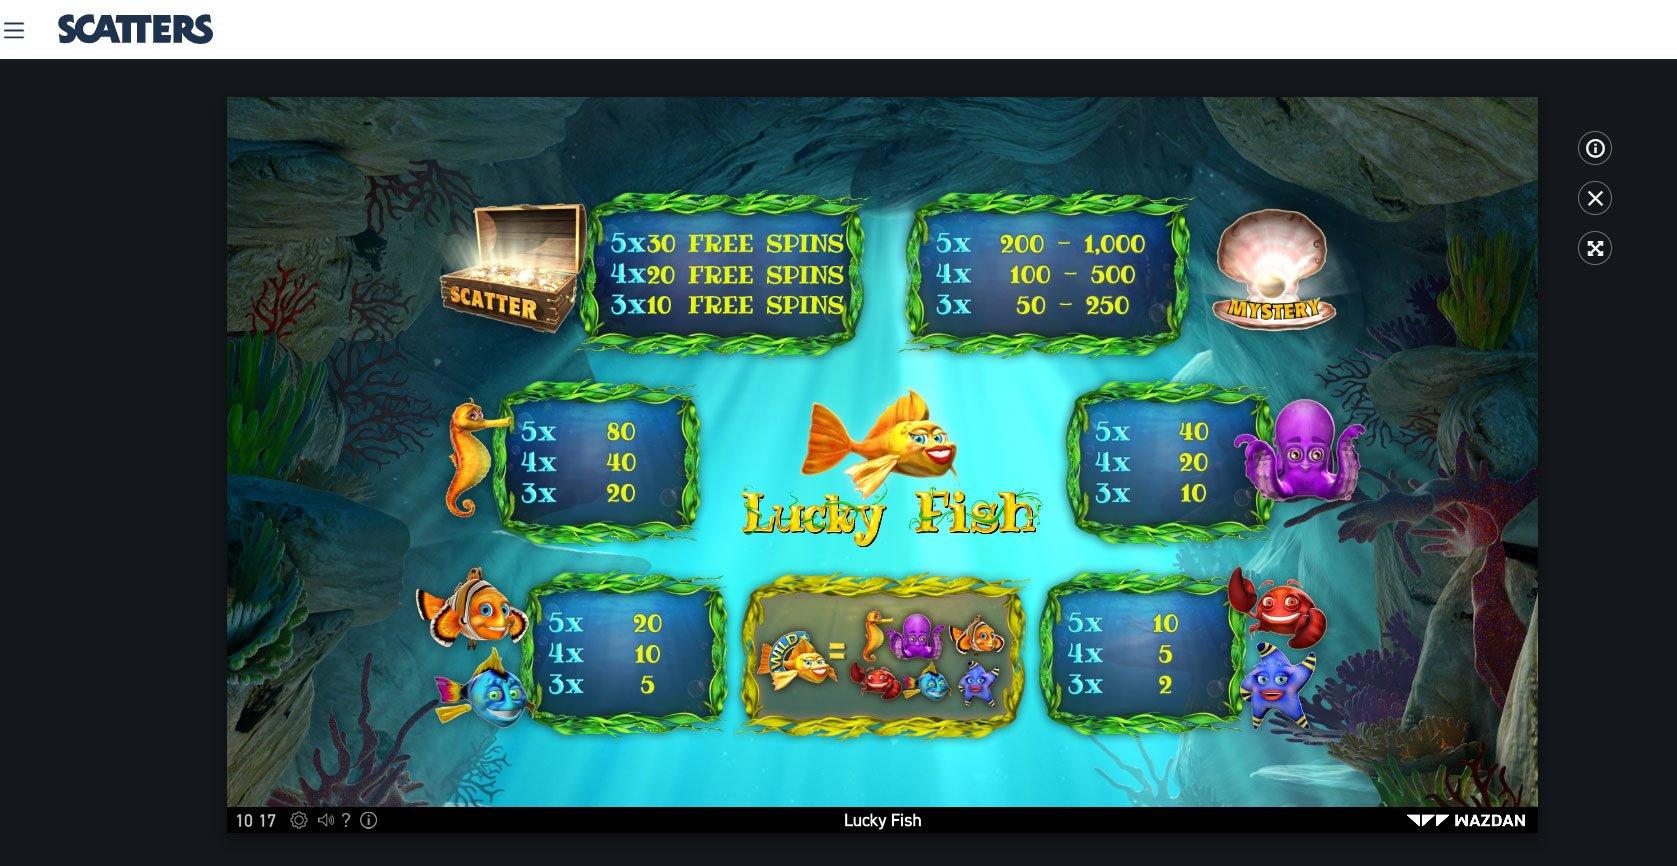 Lucky Fish online slot by Wazdan - Scatters Online Casino